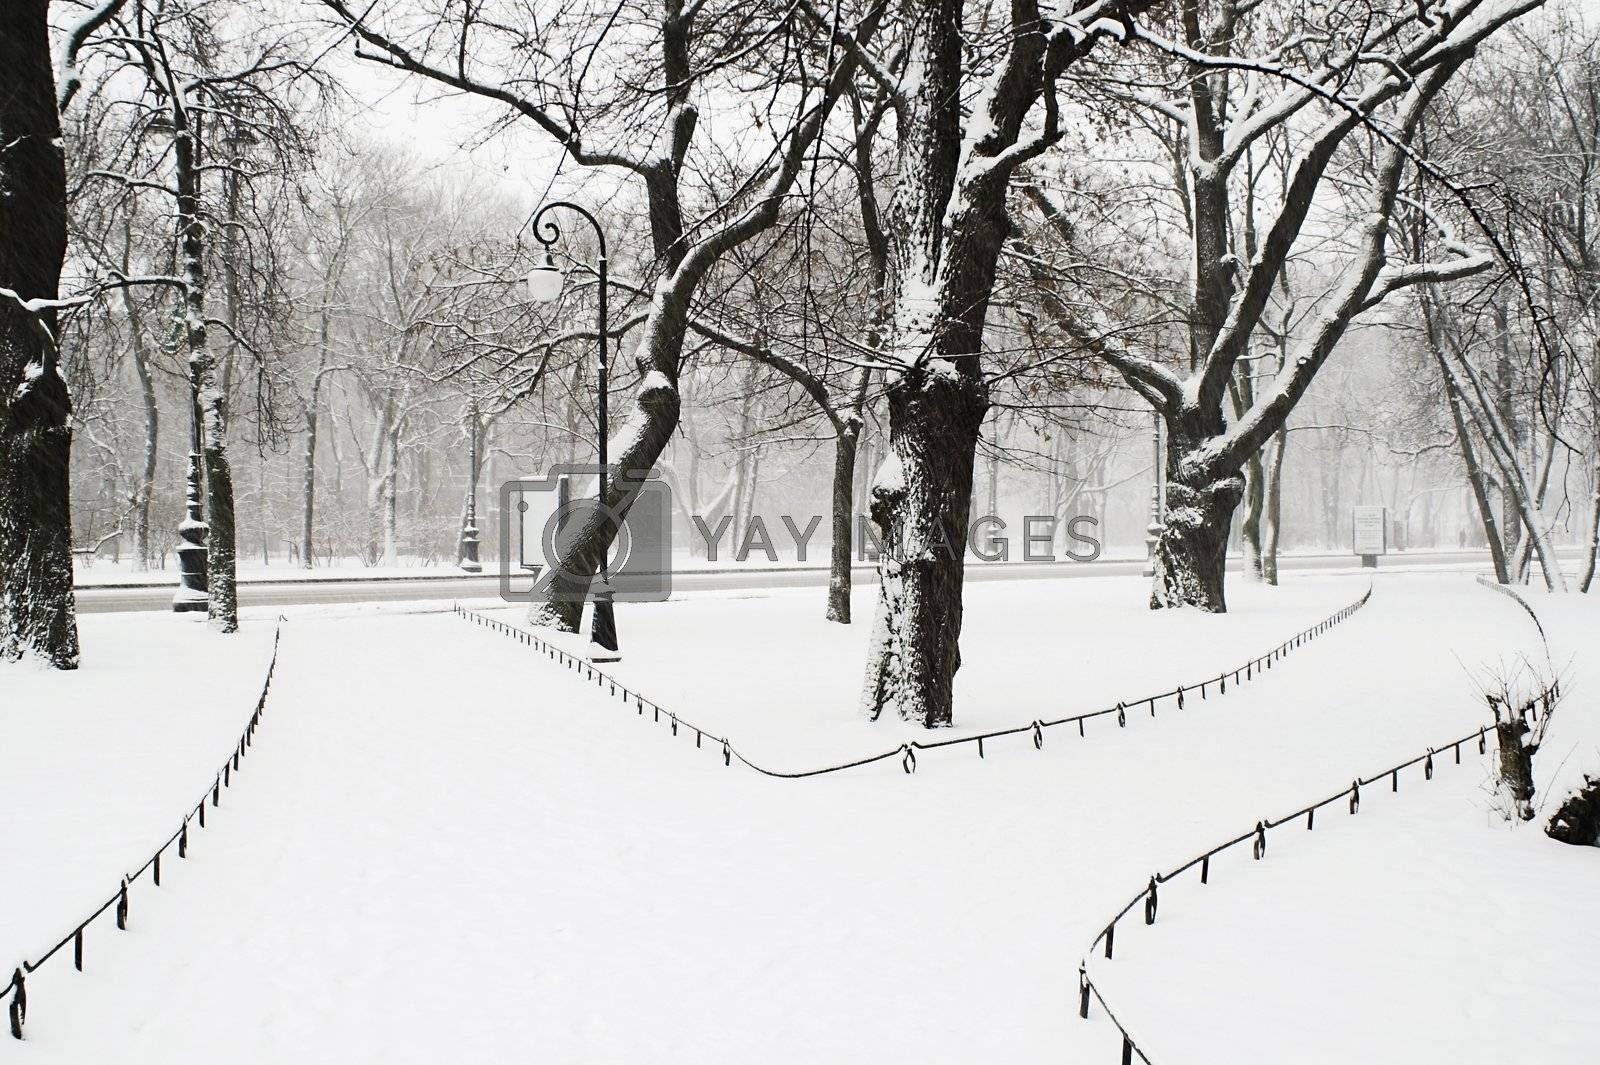 Alexandriyski park at snowfall in Saint Petersburg, Russia.